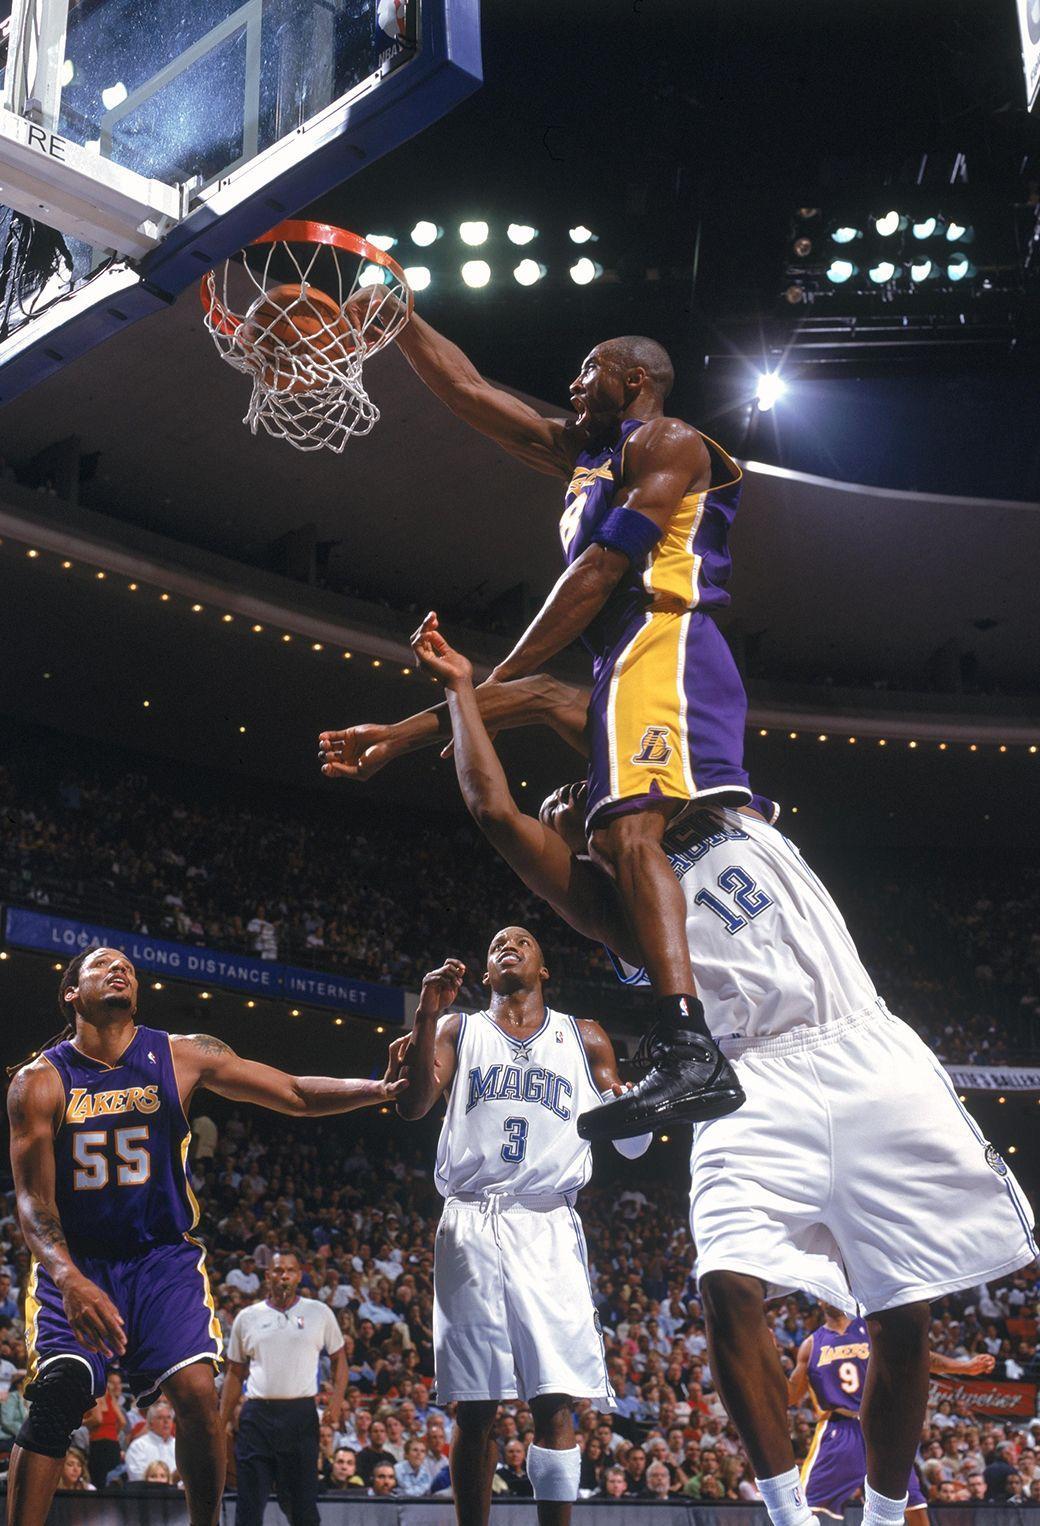 Kobe Bryant Iphone Wallpapers Top Free Kobe Bryant Iphone